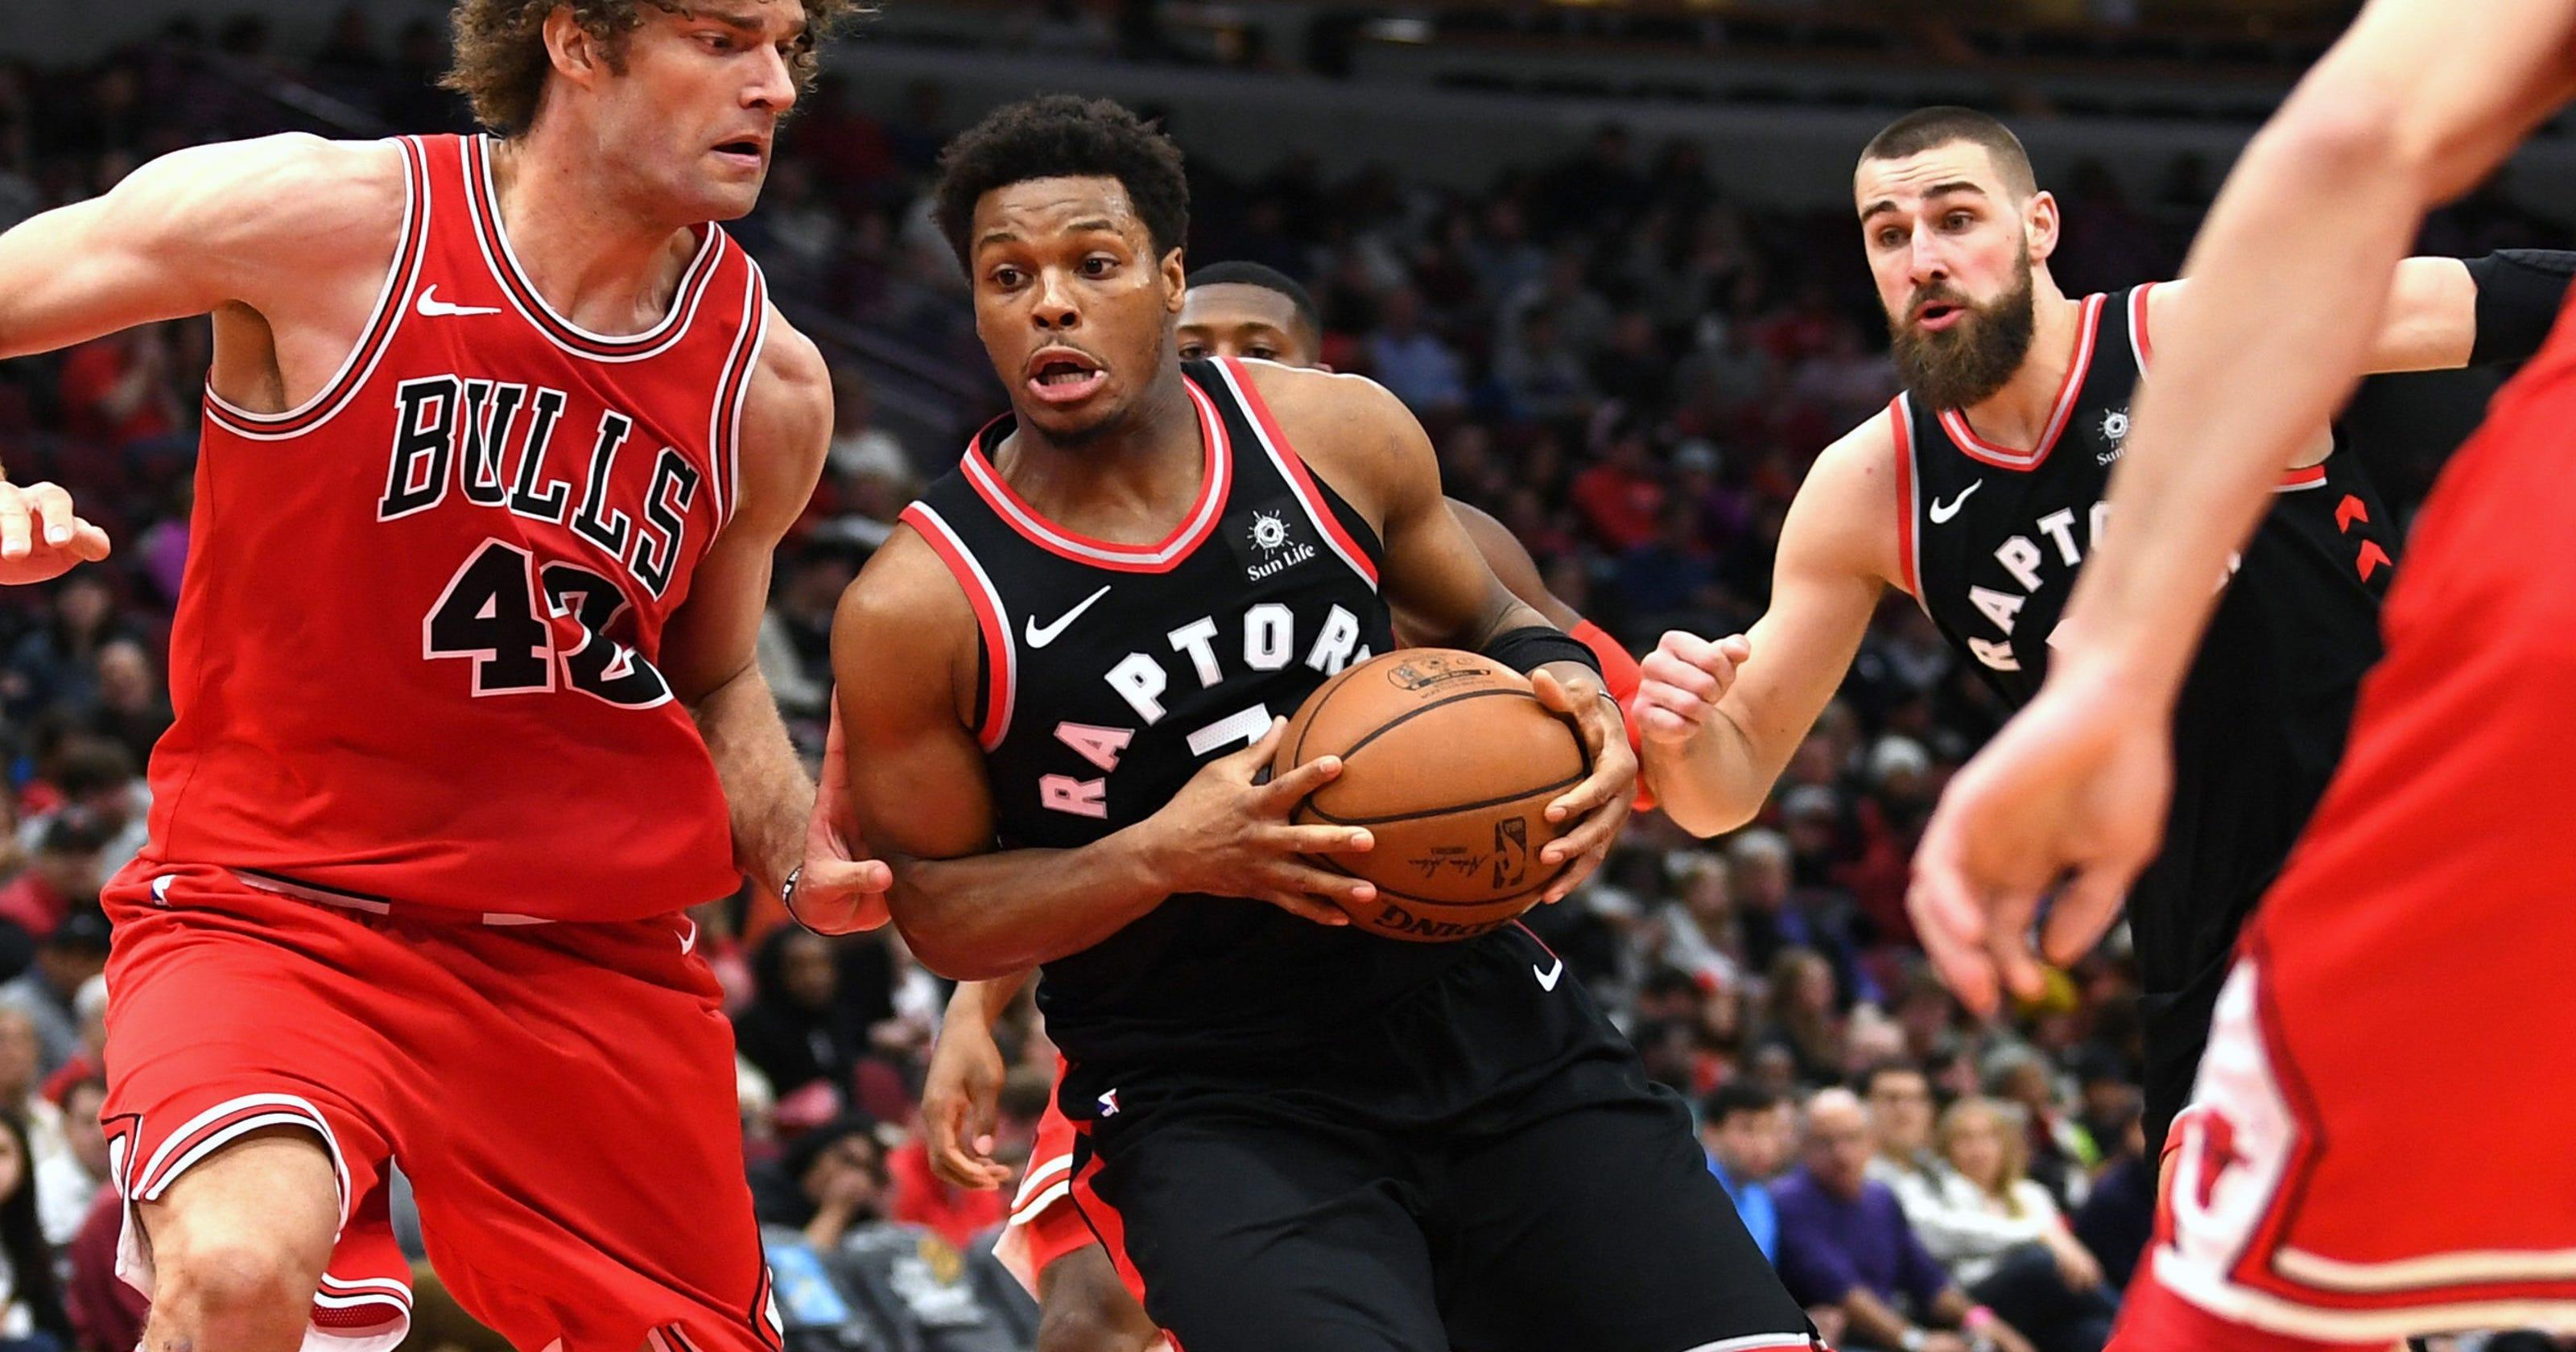 aee01aca8 Raptors roll past Bulls for seventh straight win